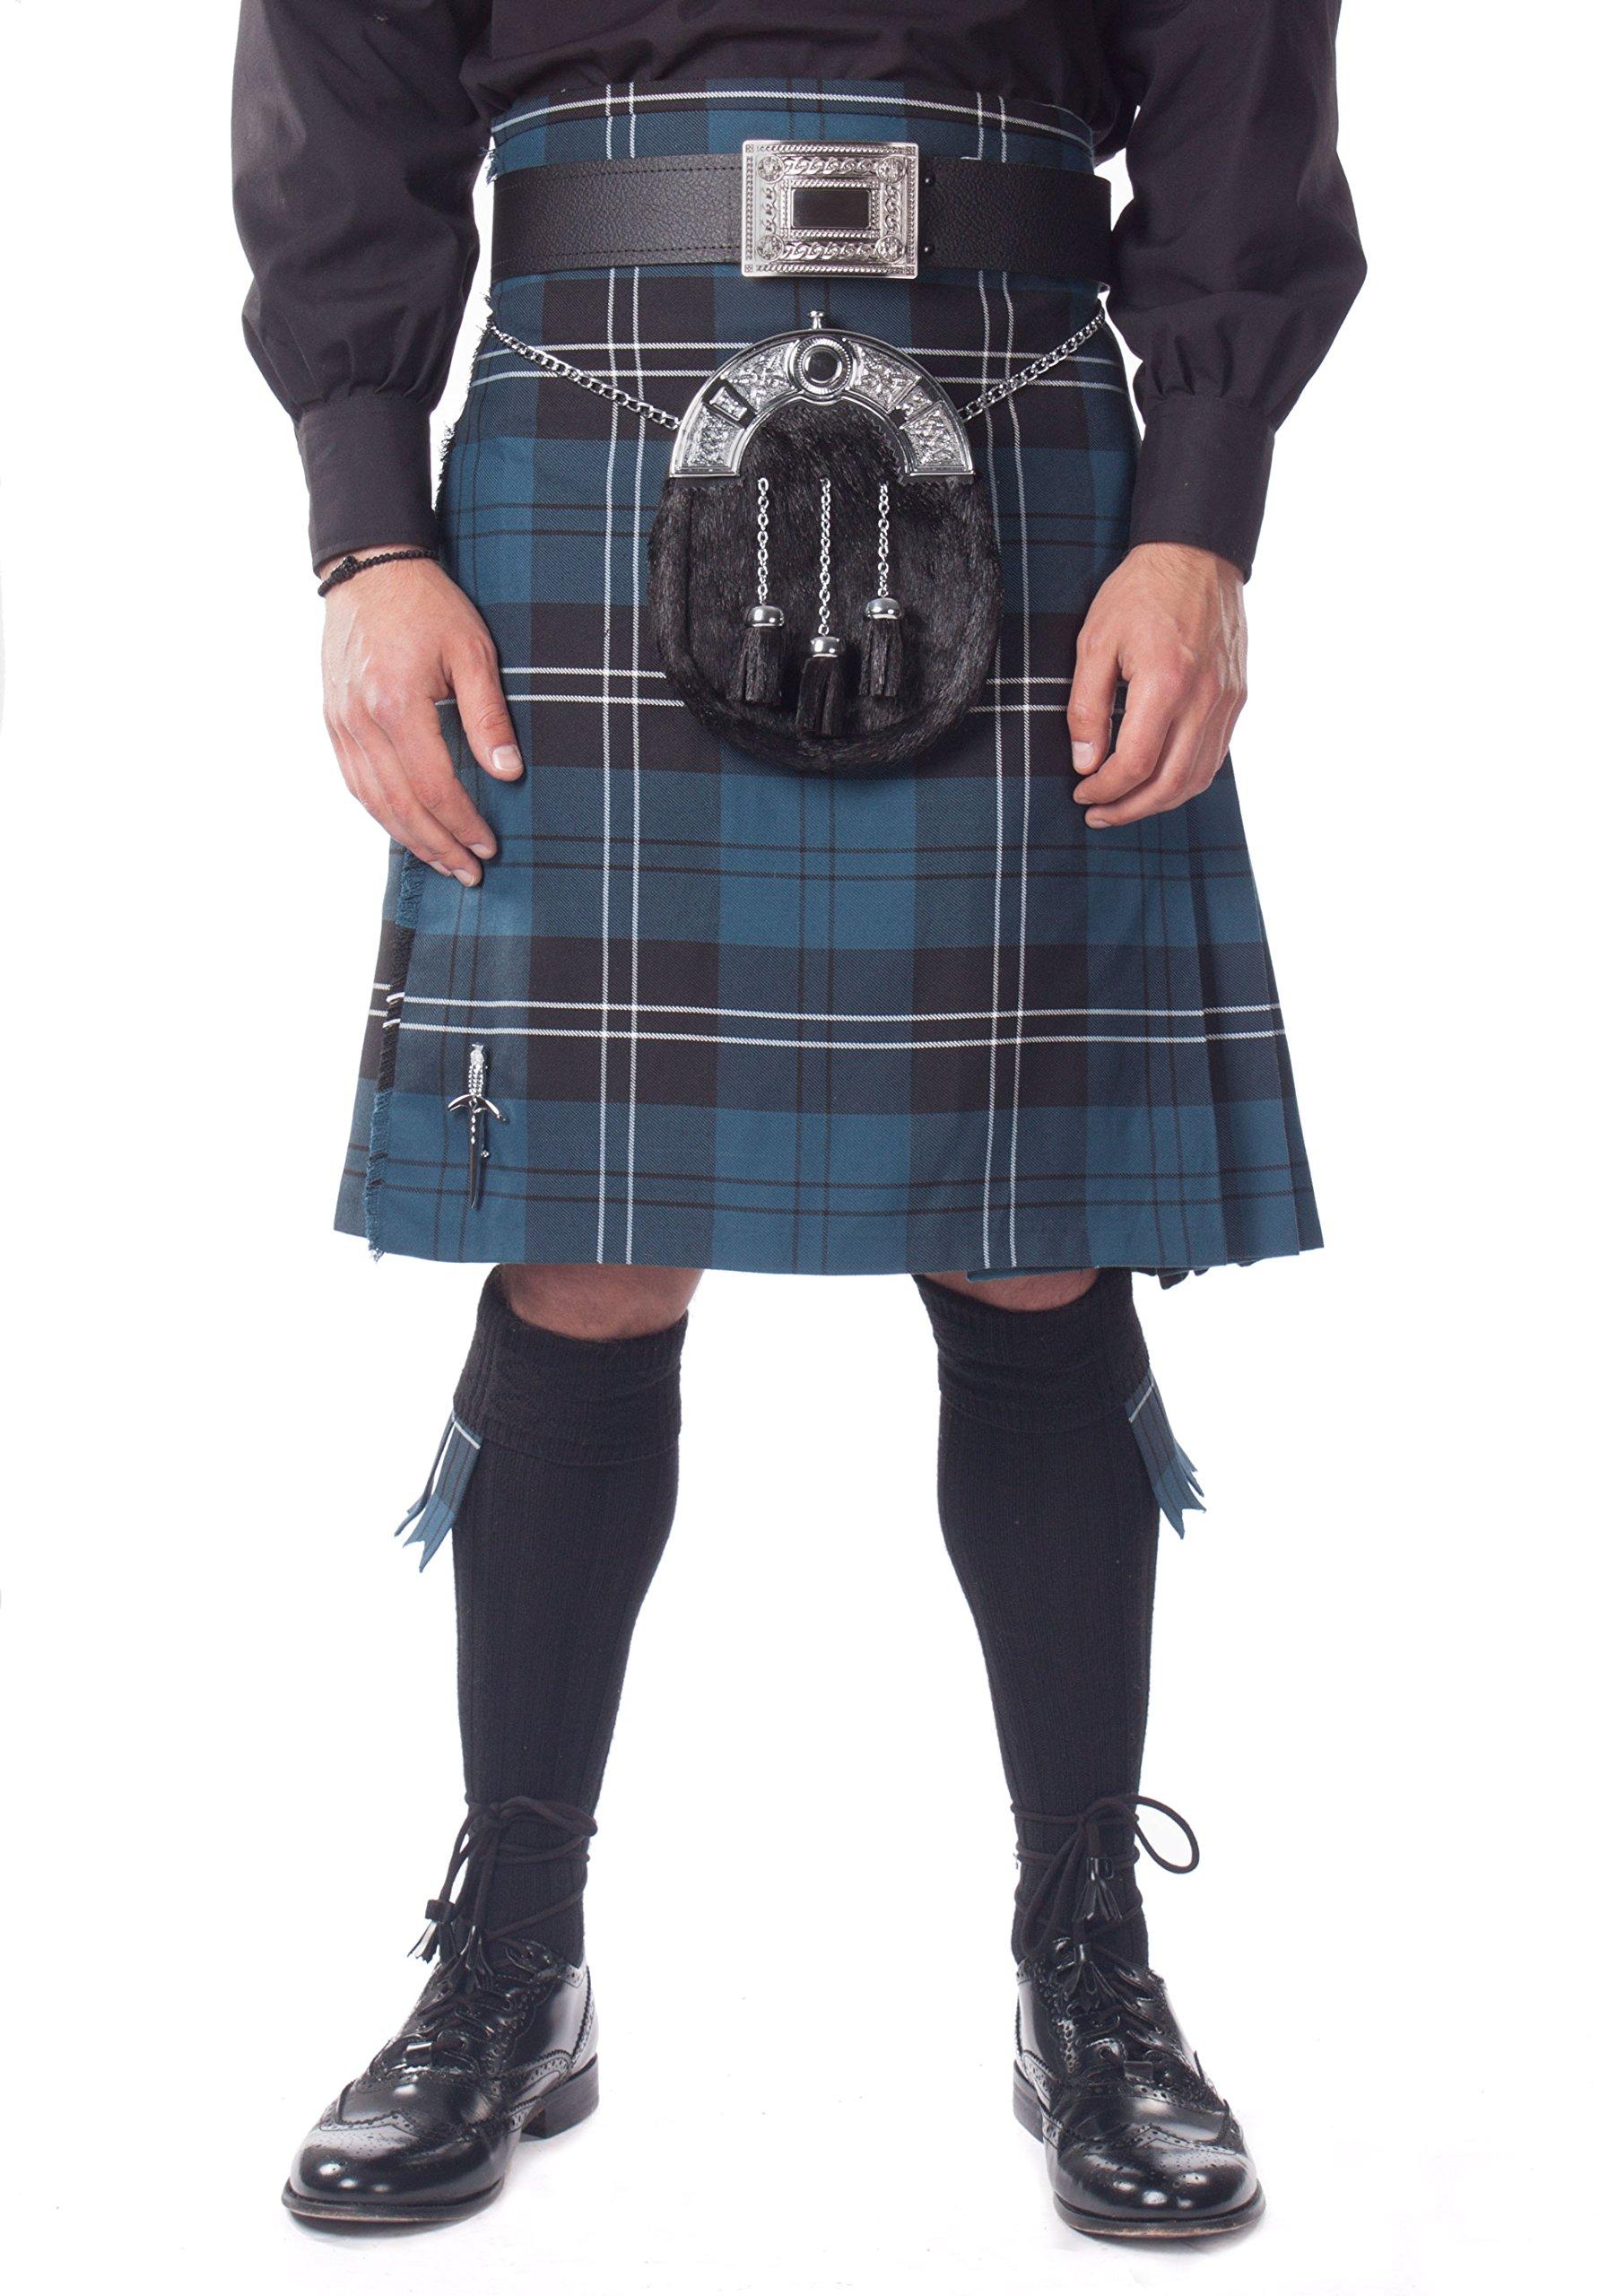 Kilt Society Mens 7 Piece Full Dress Kilt Outfit- Ramsay Blue Tartan with Black Hose 42'' to 46'' by Kilt Society (Image #1)